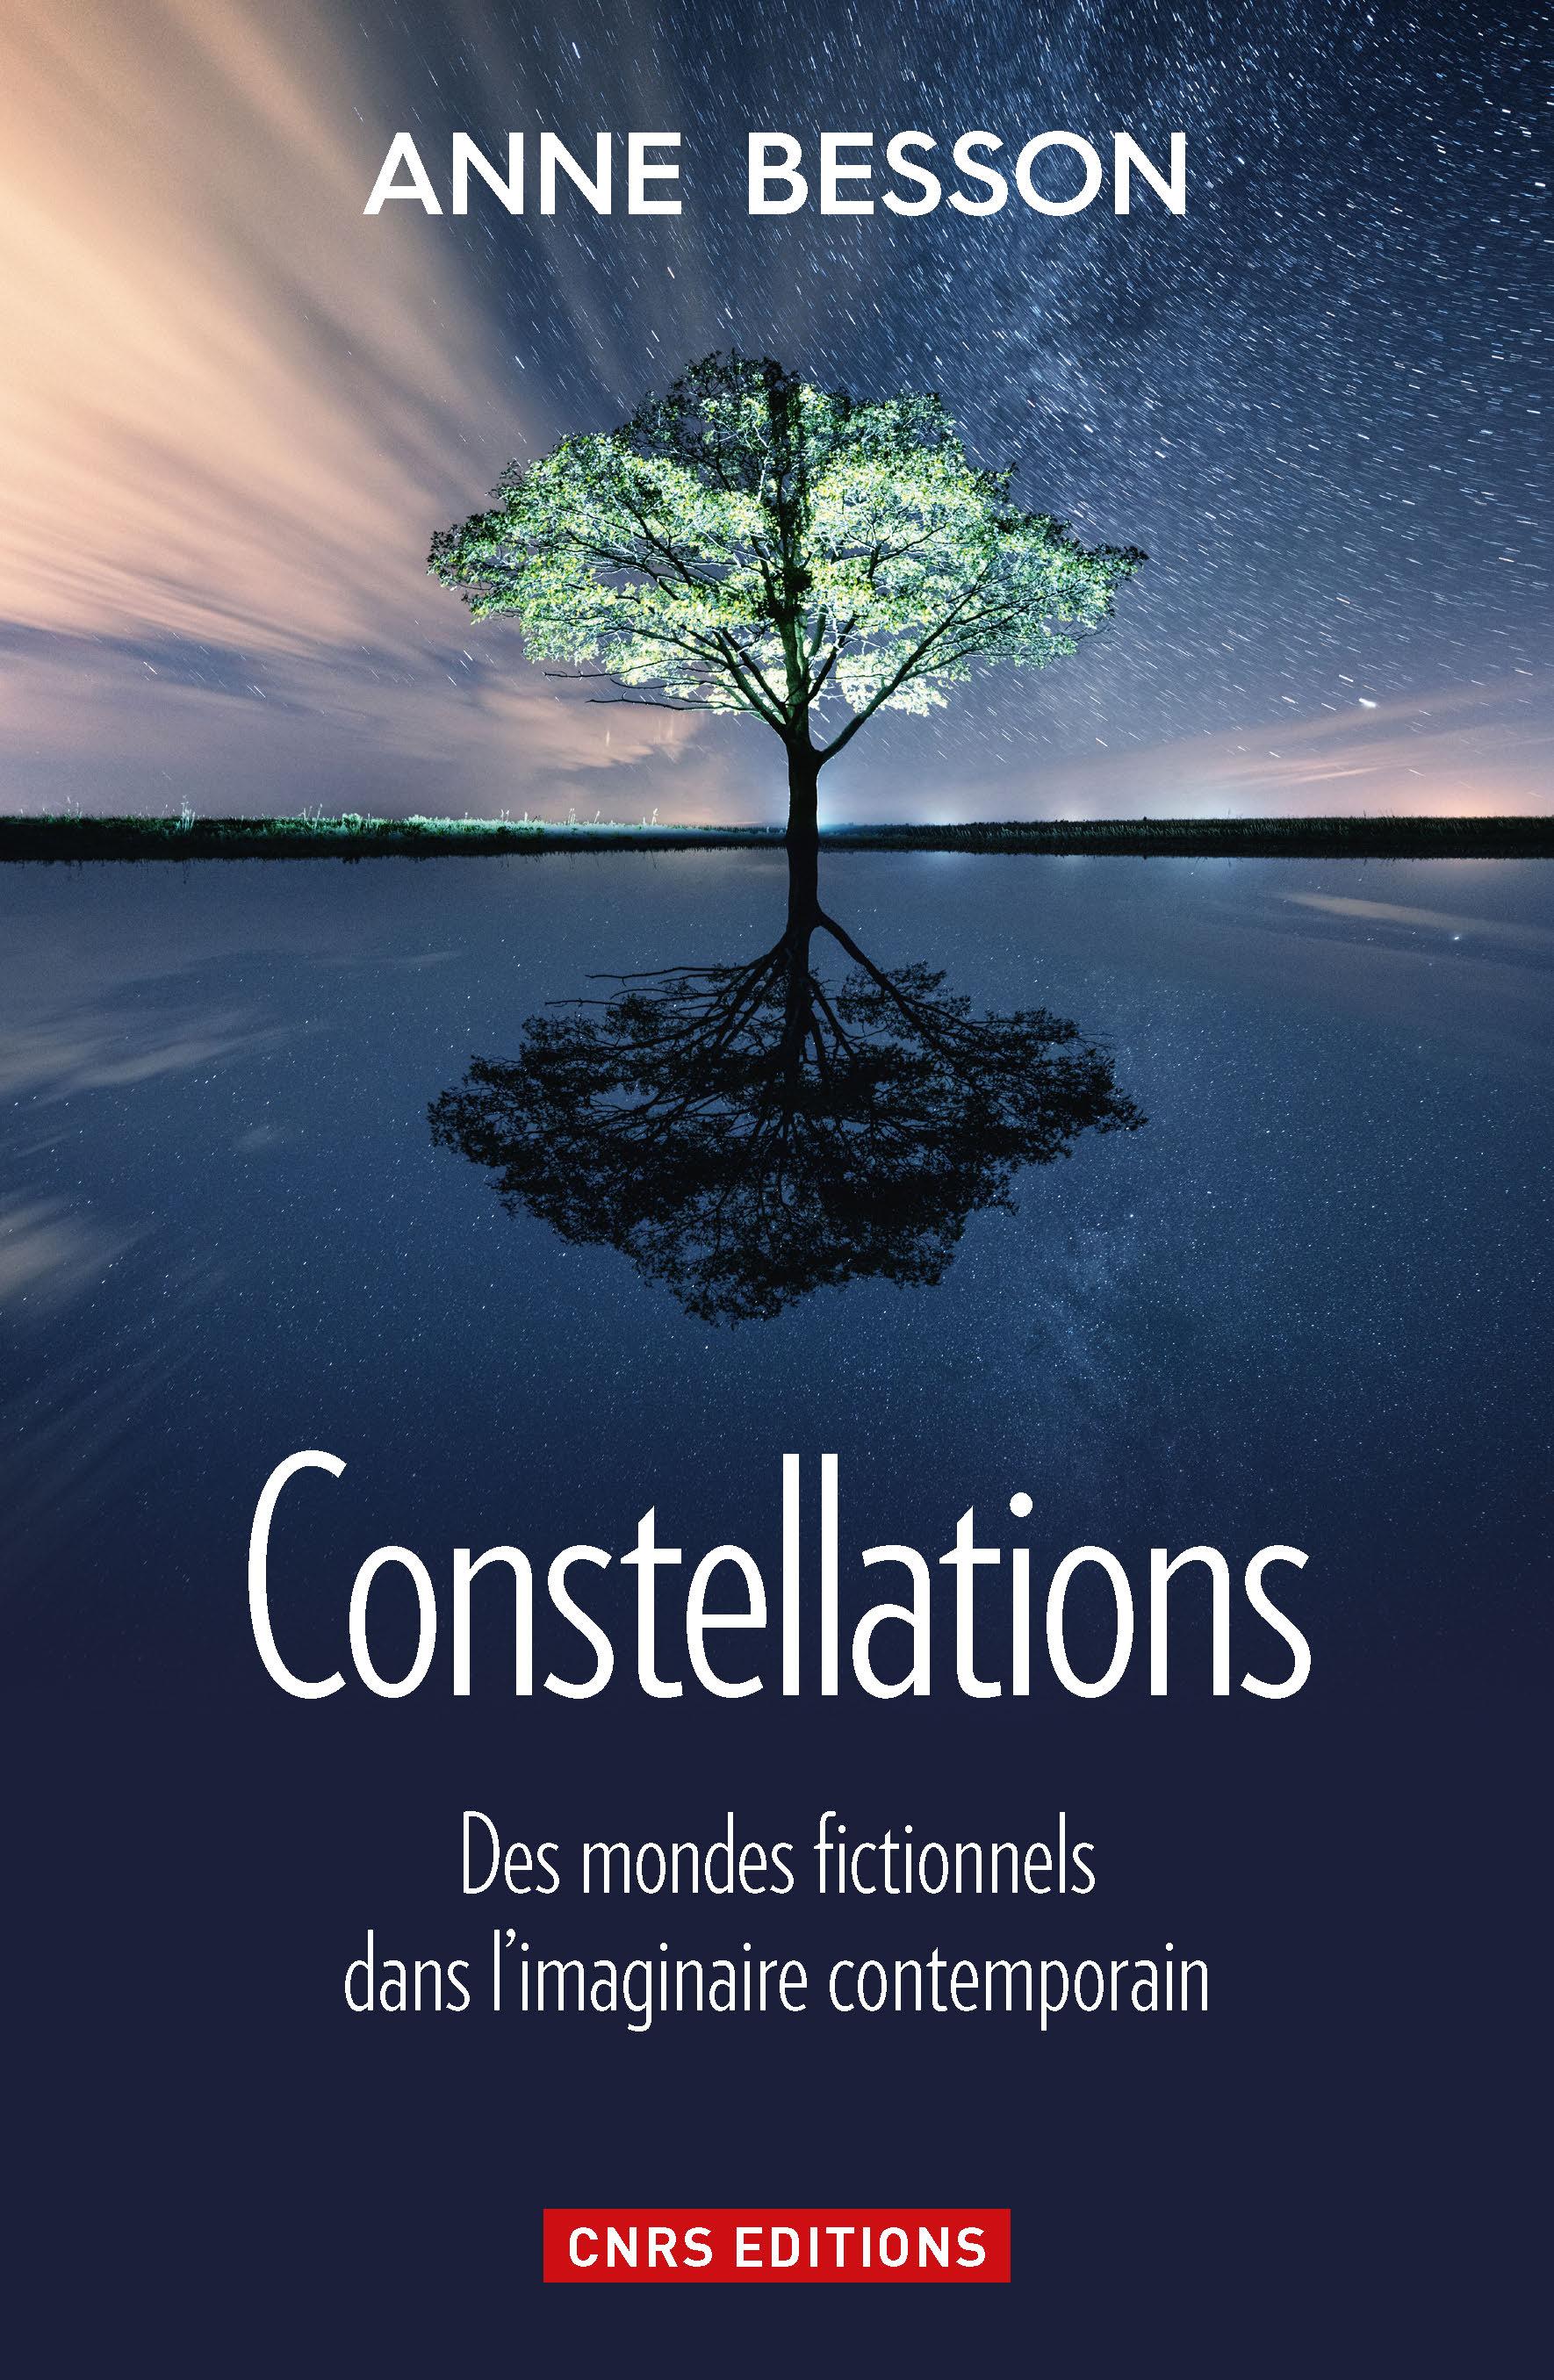 08341-Constellations